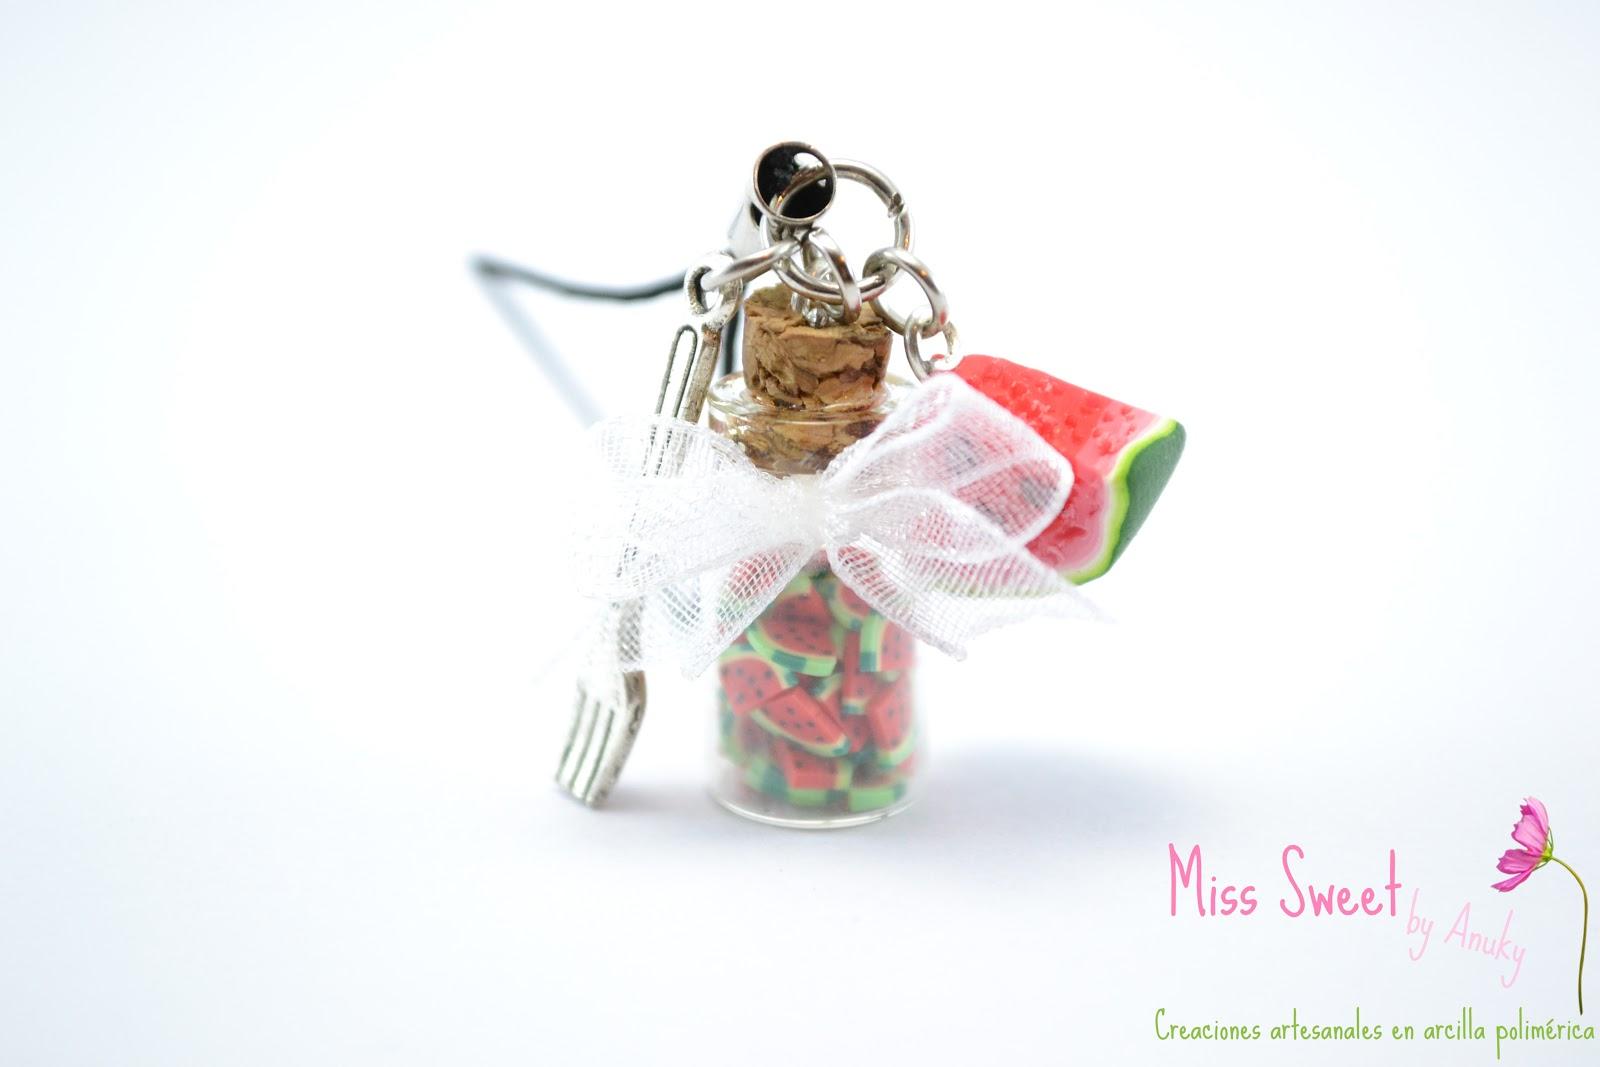 Conociendo_a_Miss_Sweet_The_Pink_Graff_04